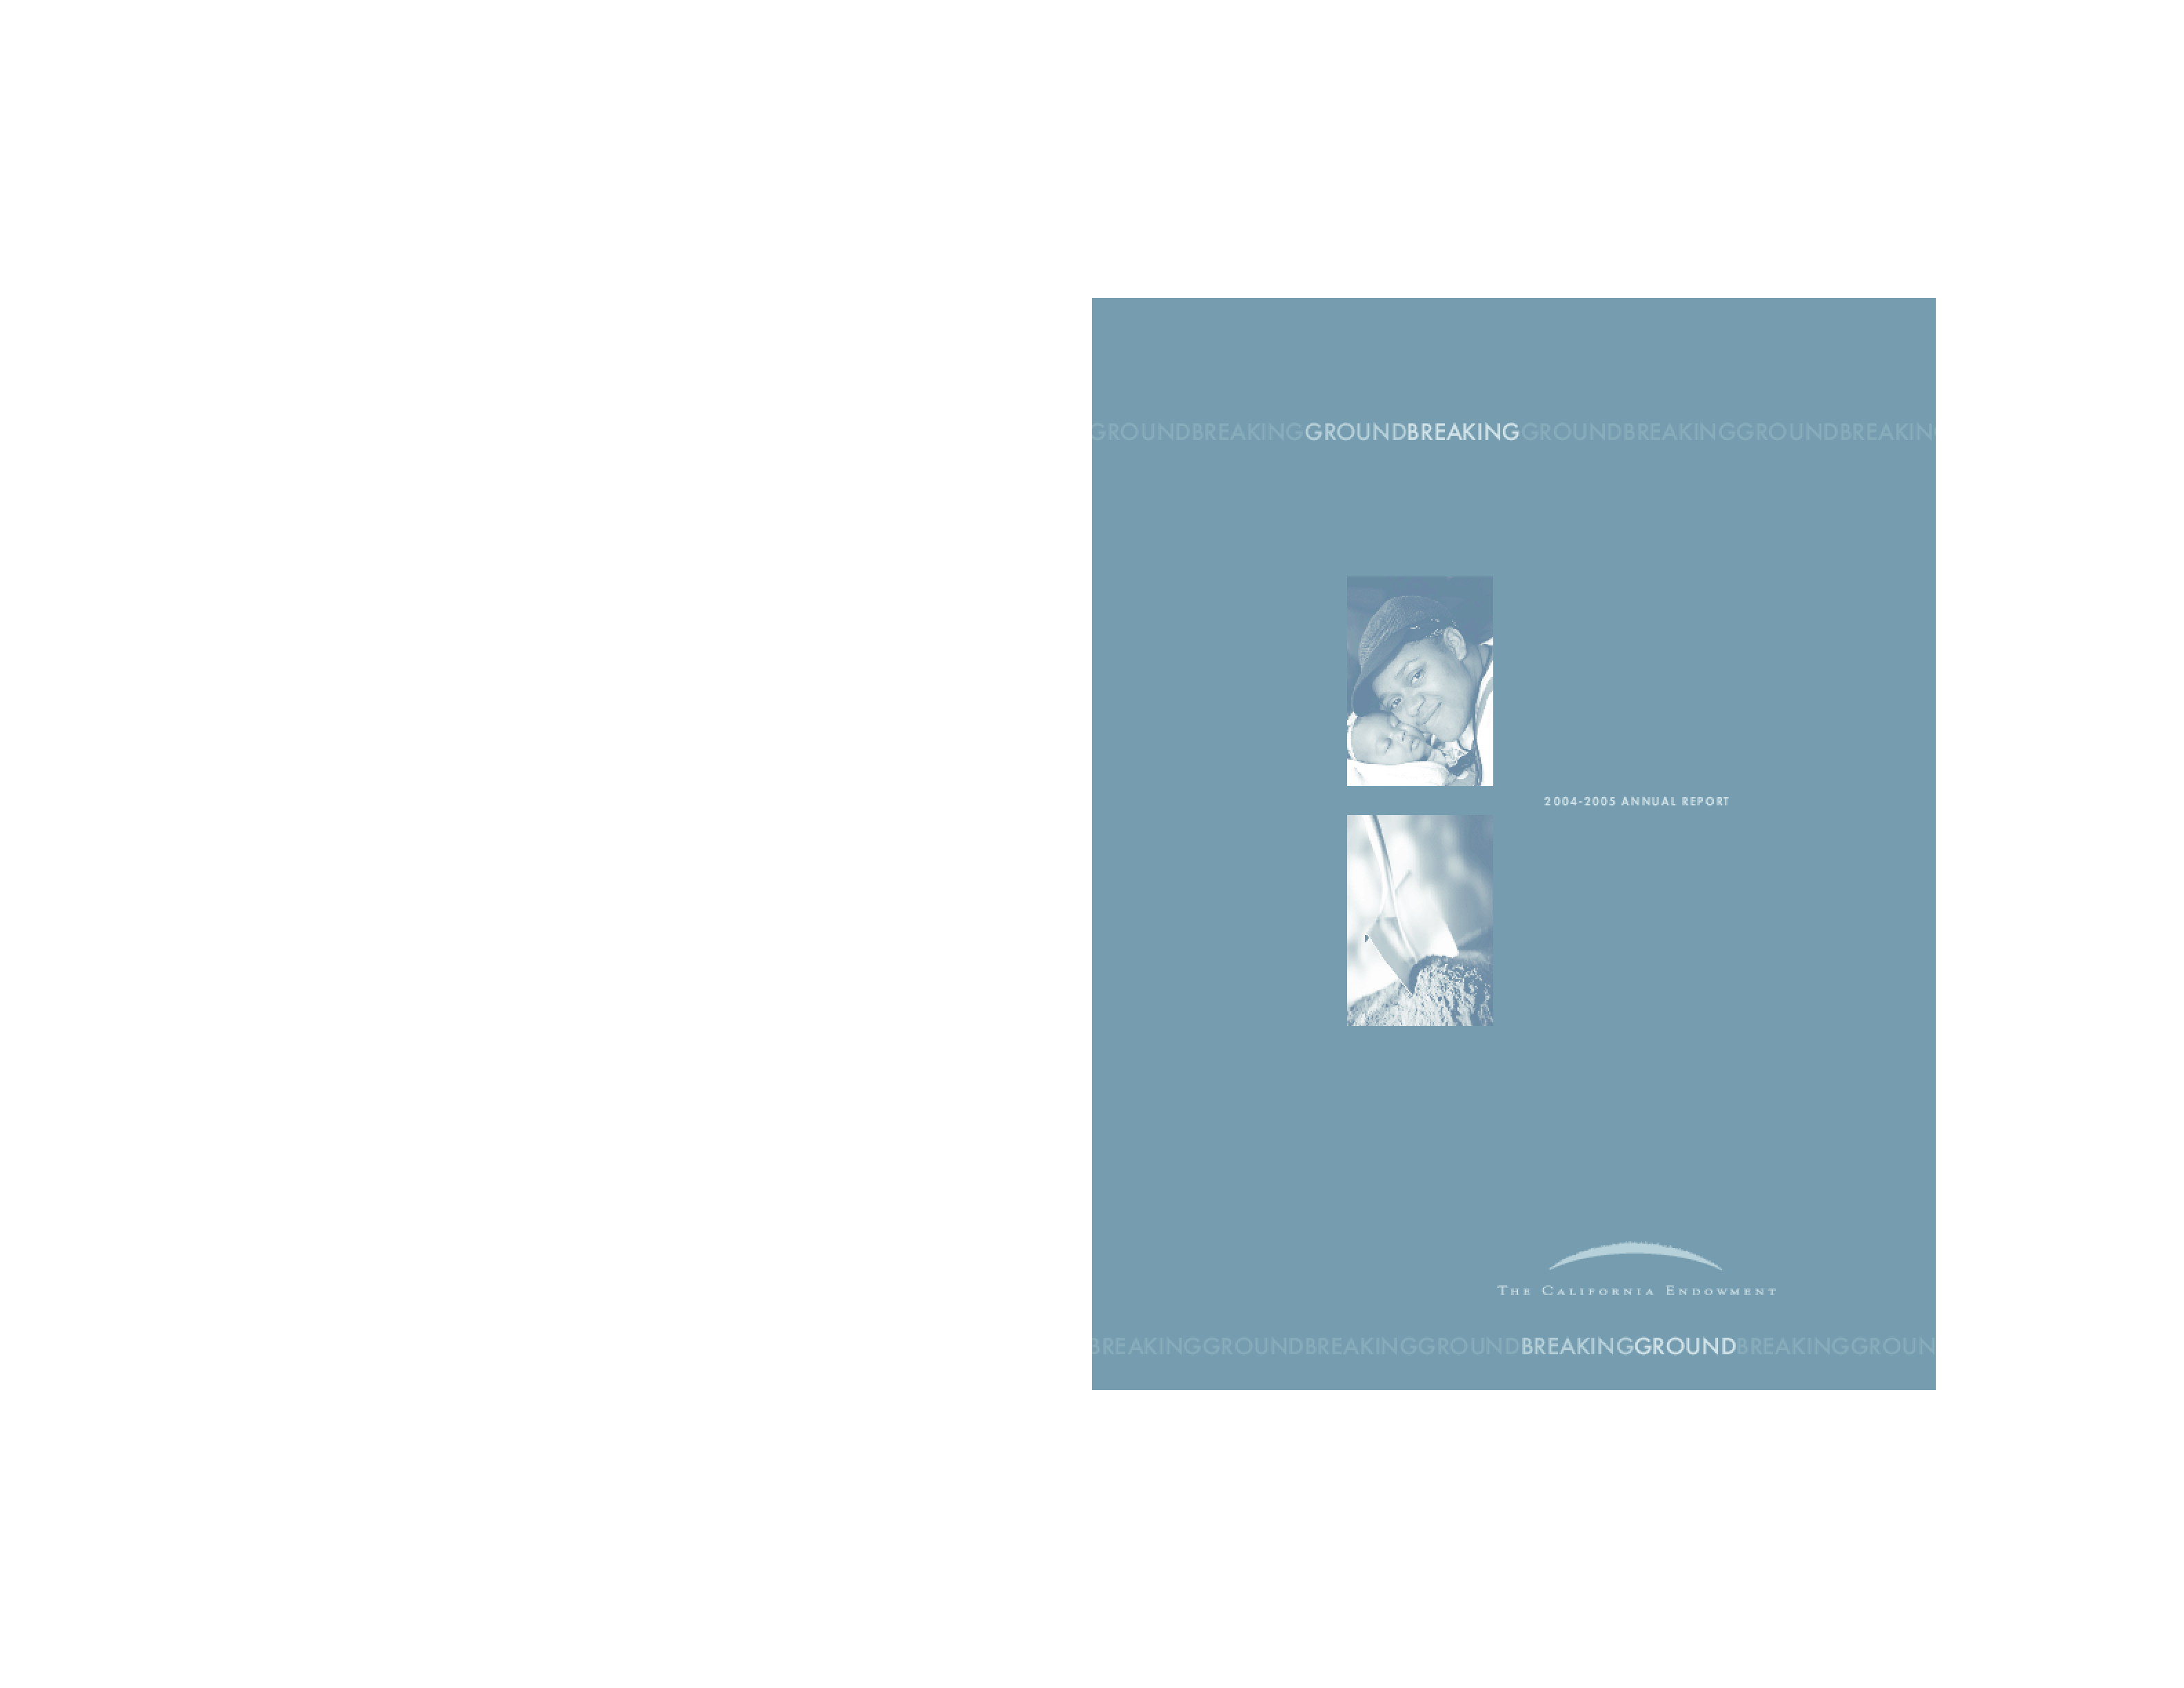 California Endowment - 2004-2005 Annual Report: Breaking Ground